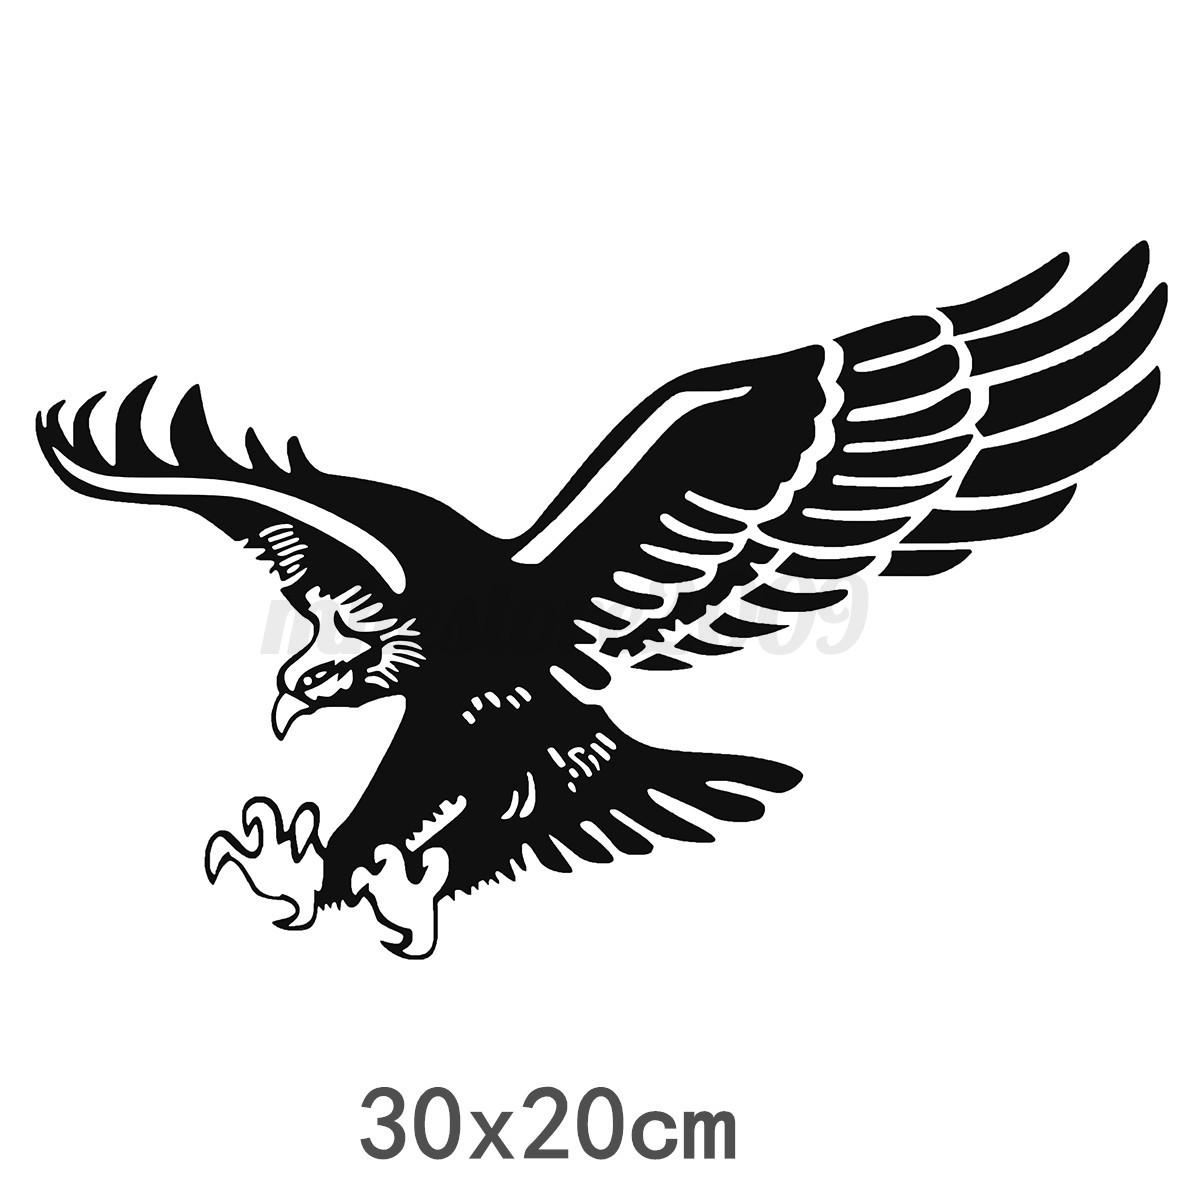 Car Truck Suv Decal Vinyl Sticker Hood Decals Flying Eagle